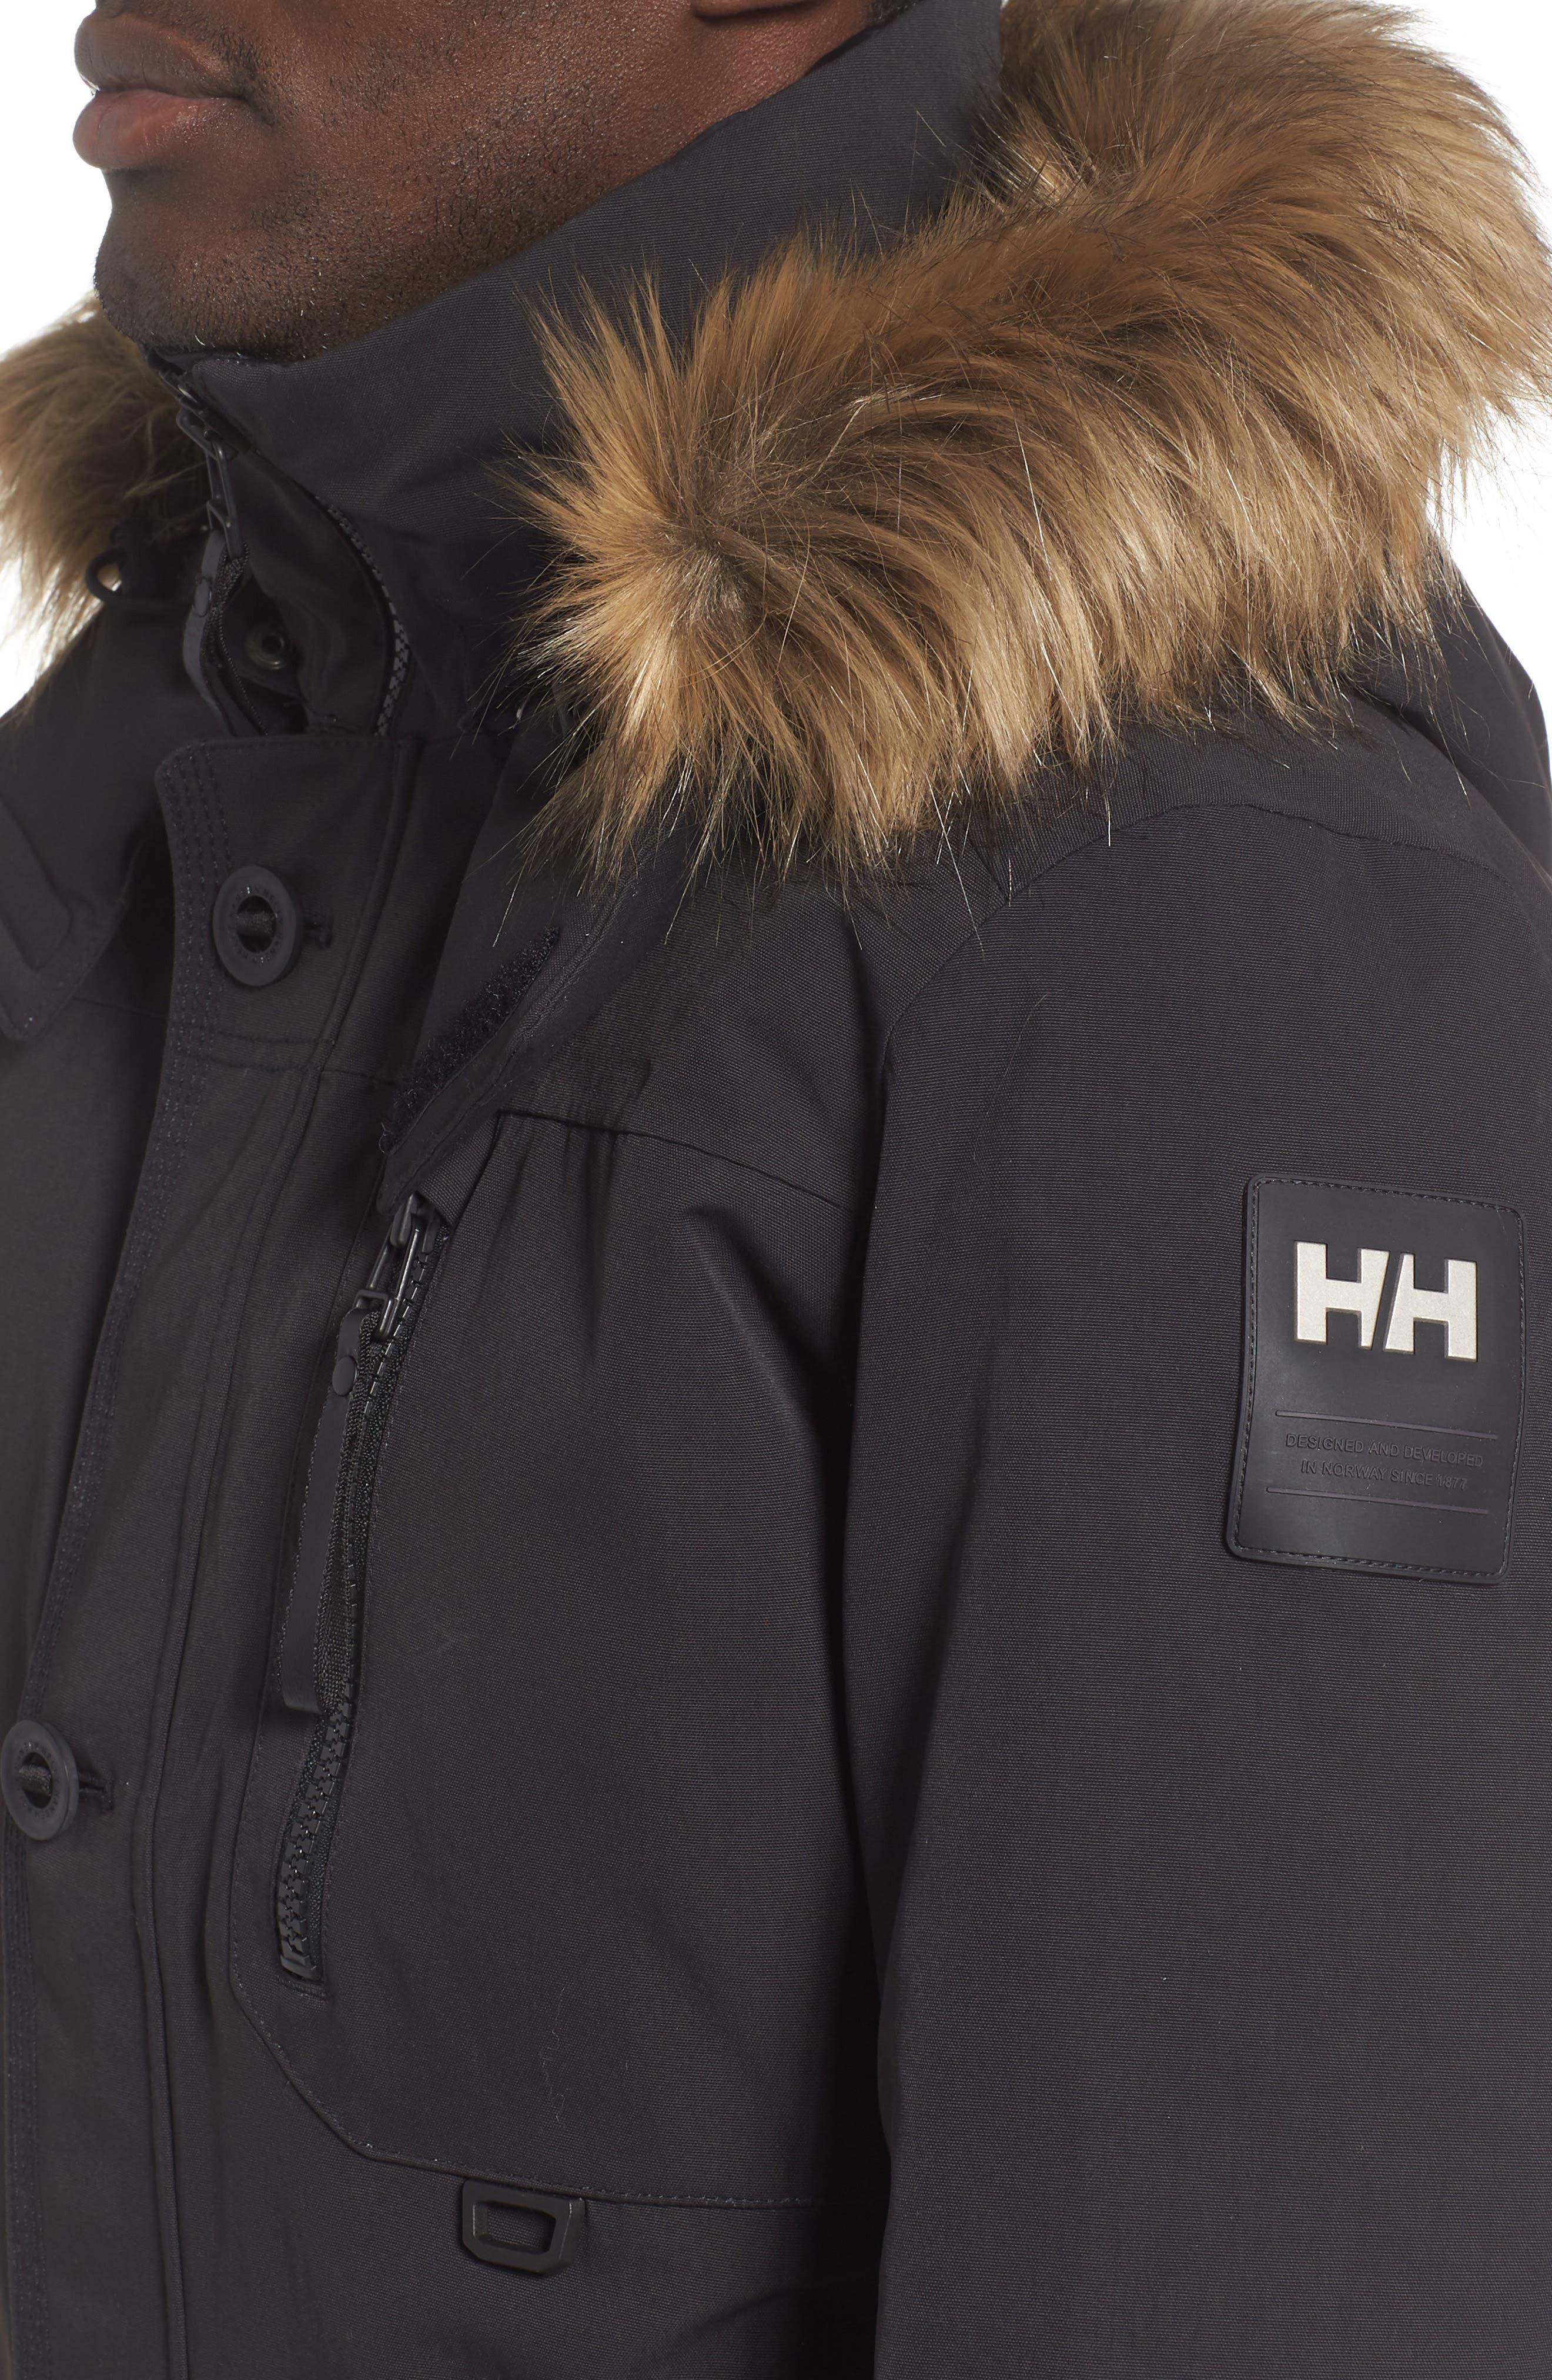 Bardu Waterproof Bomber Jacket with Detachable Hood and Faux Fur Trim,                             Alternate thumbnail 4, color,                             BLACK